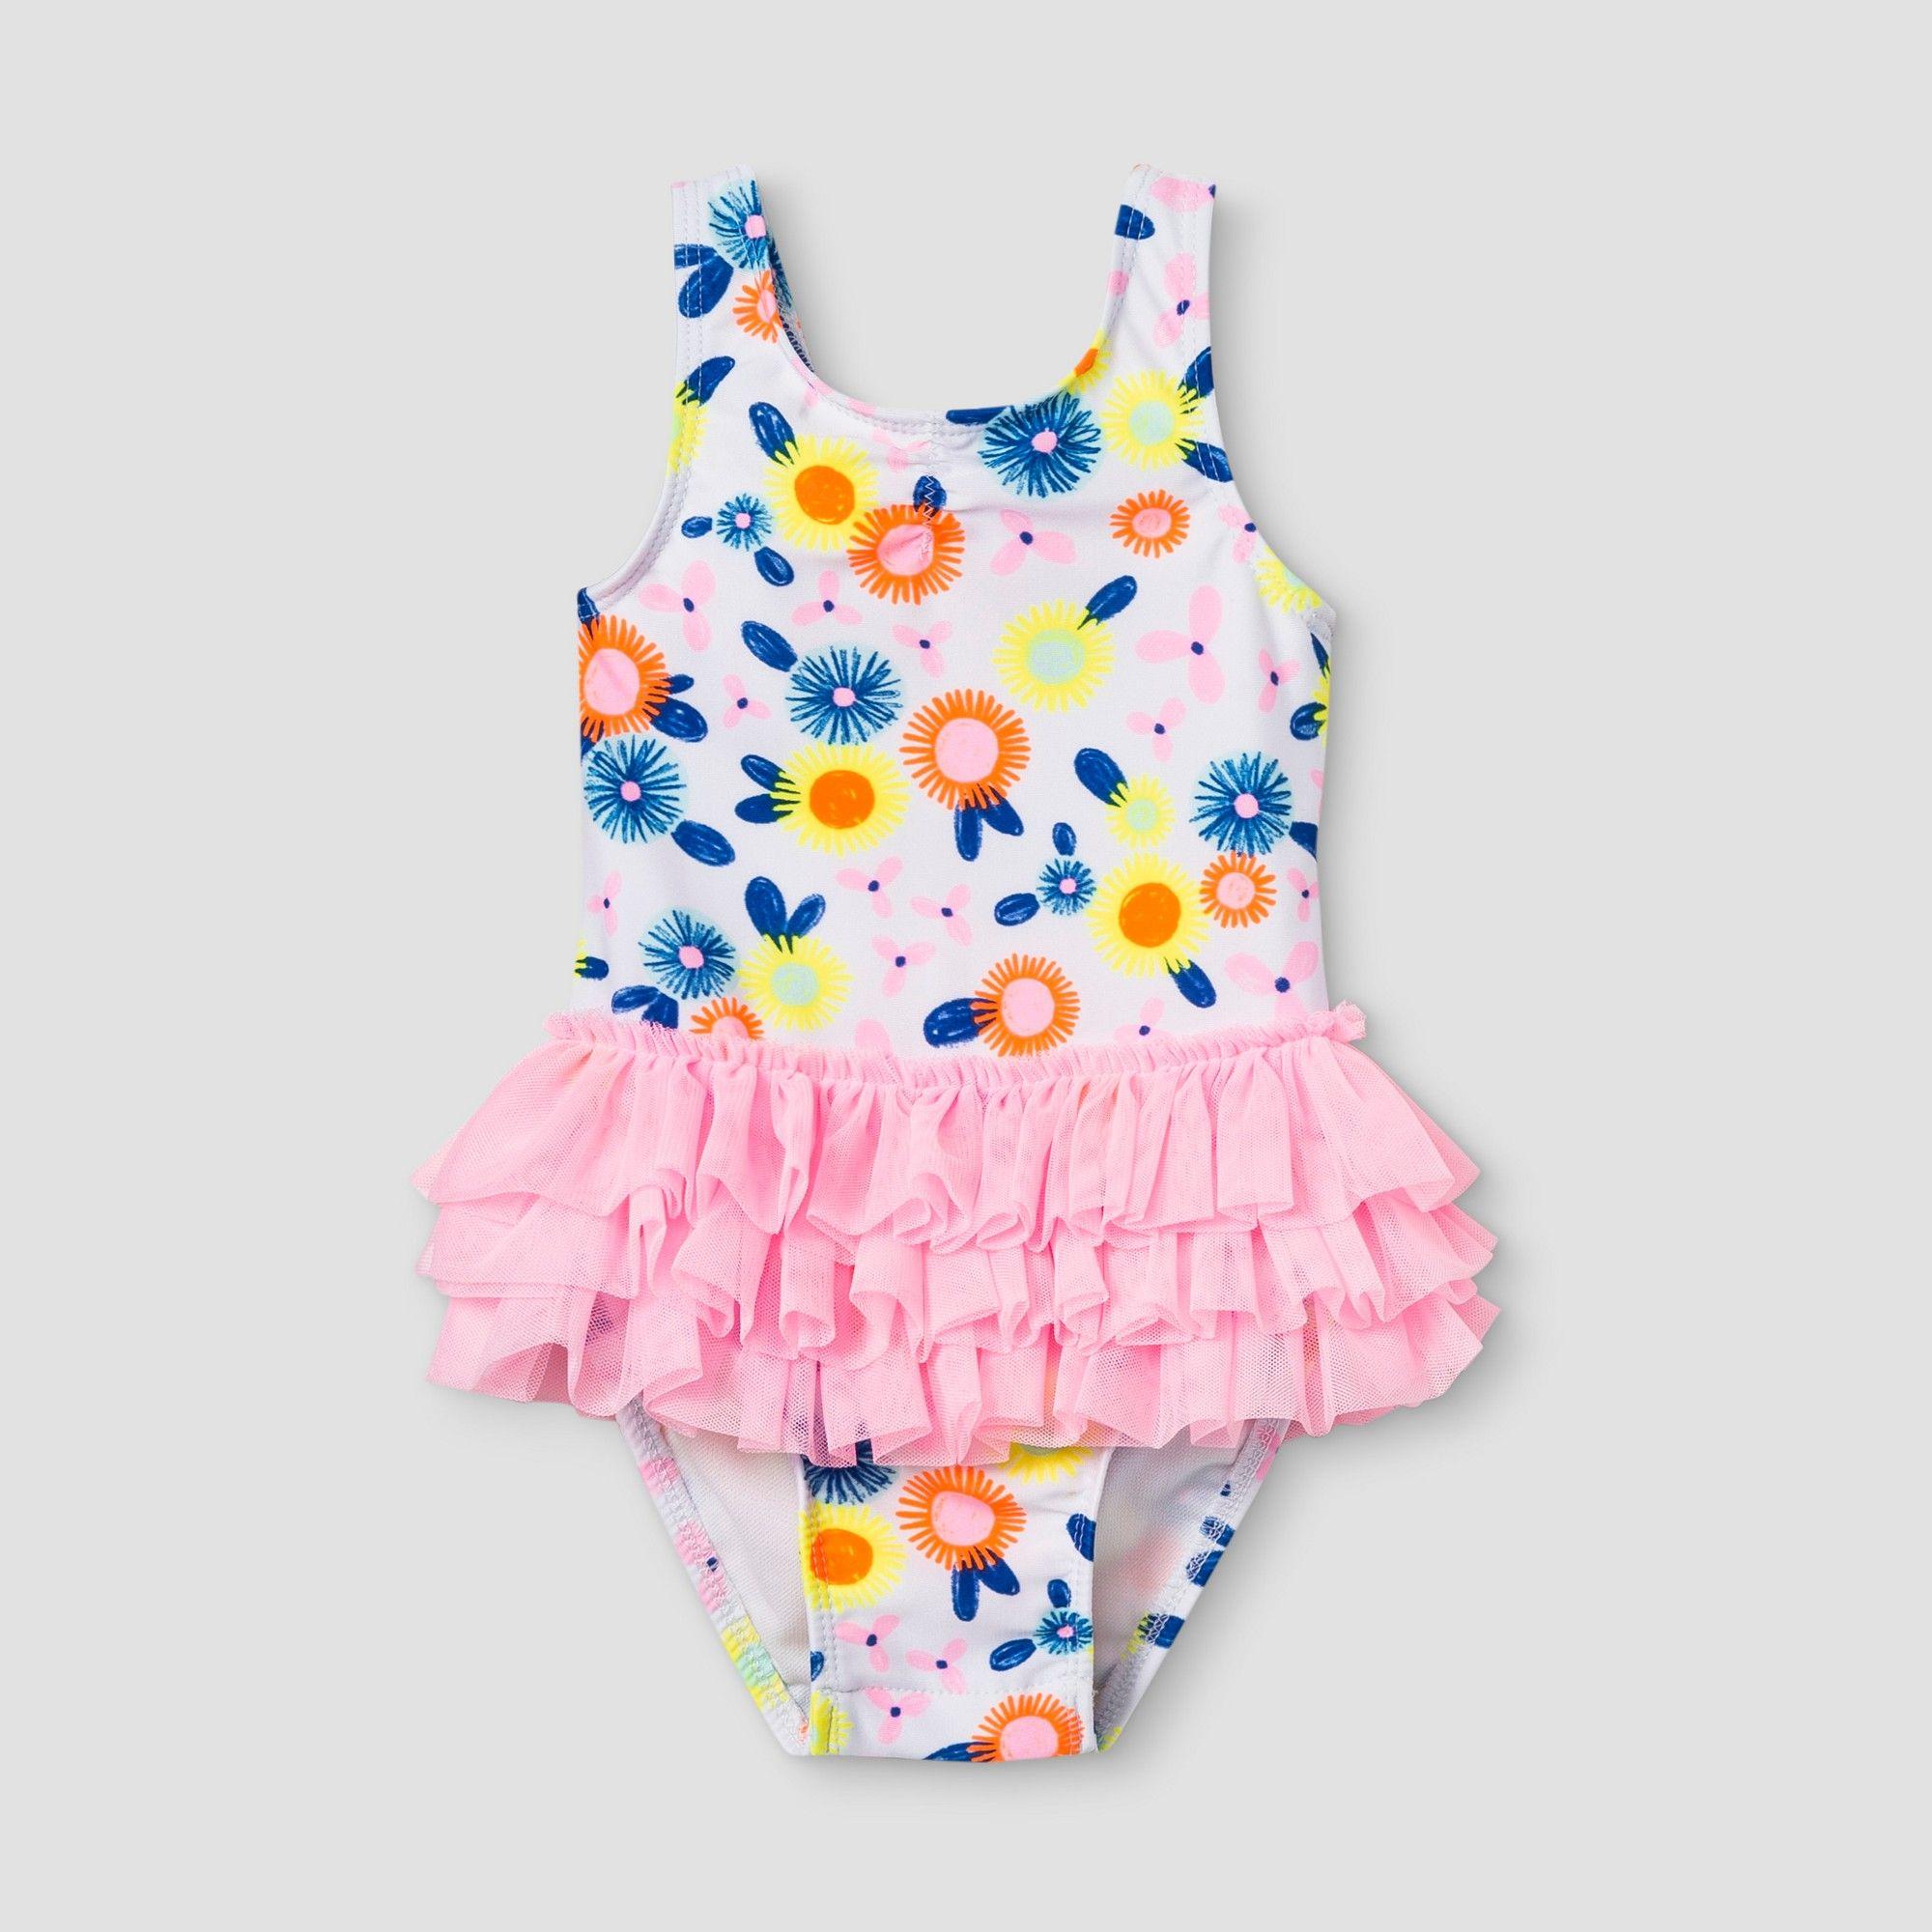 18m Baby Swimwear Toddler Girl Swimsuit